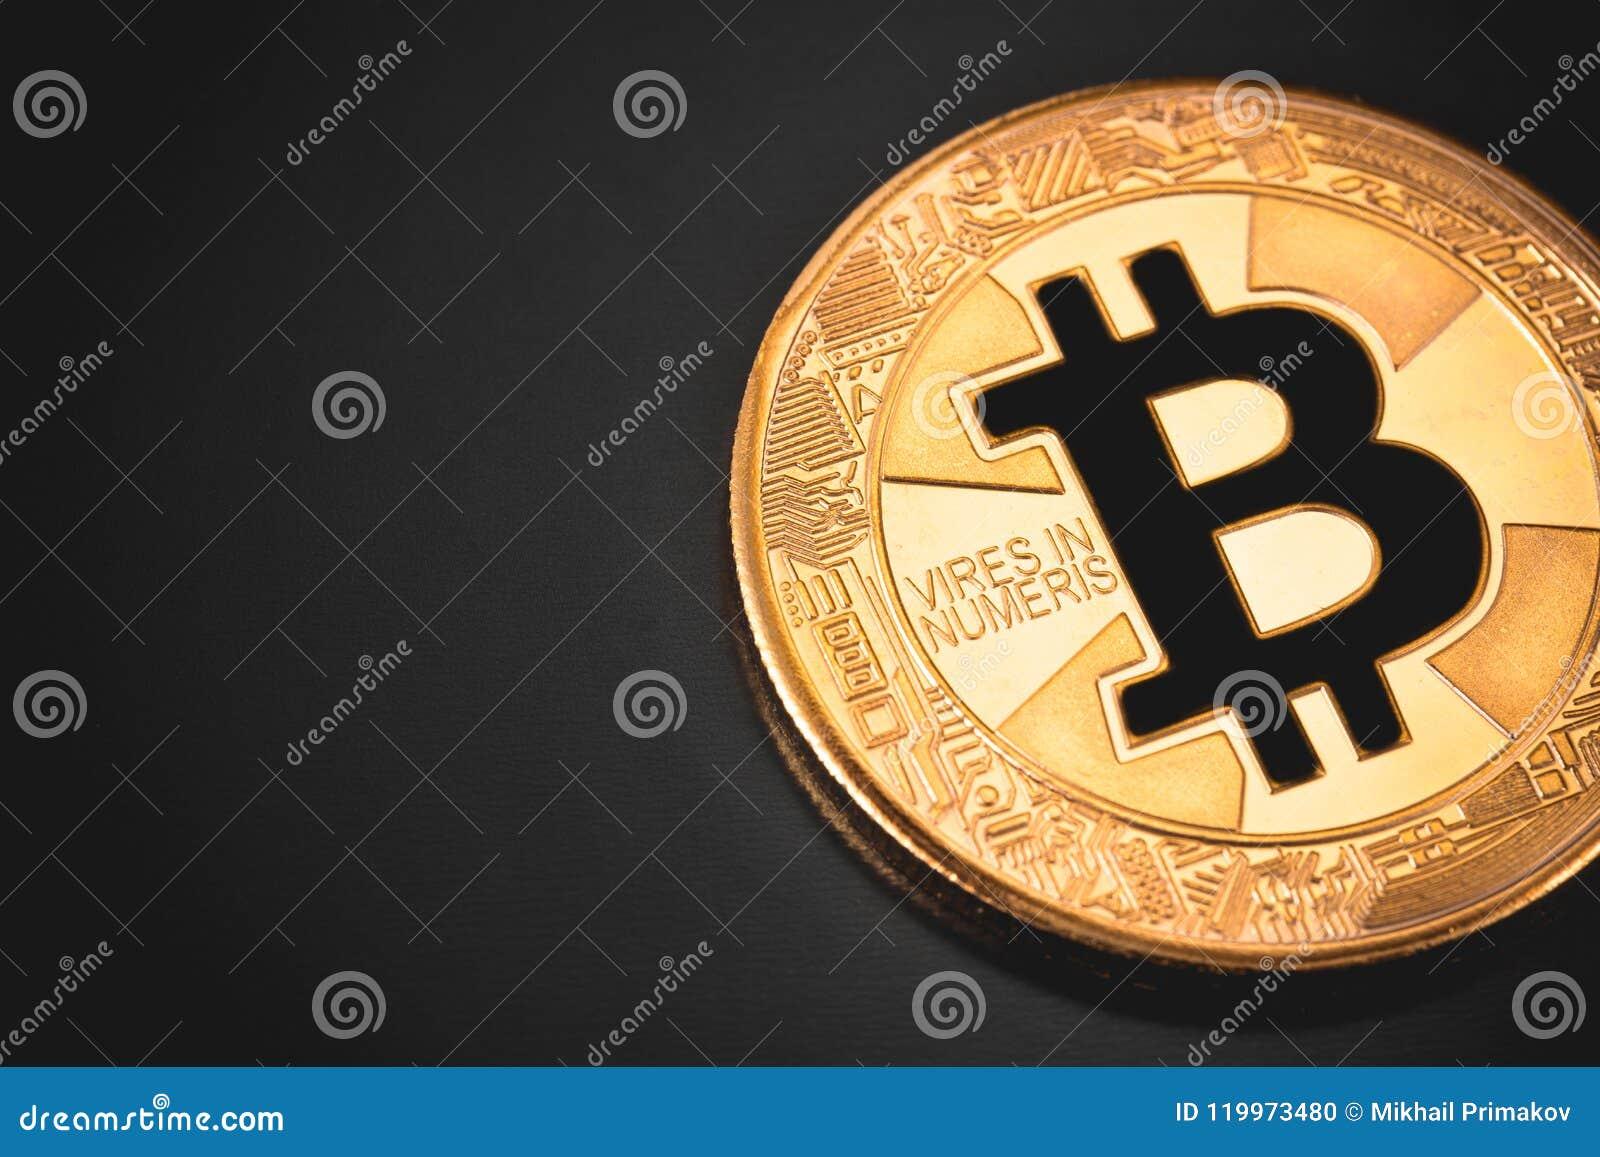 Bitcoin symbol and logo stock photo. Image of financial ...